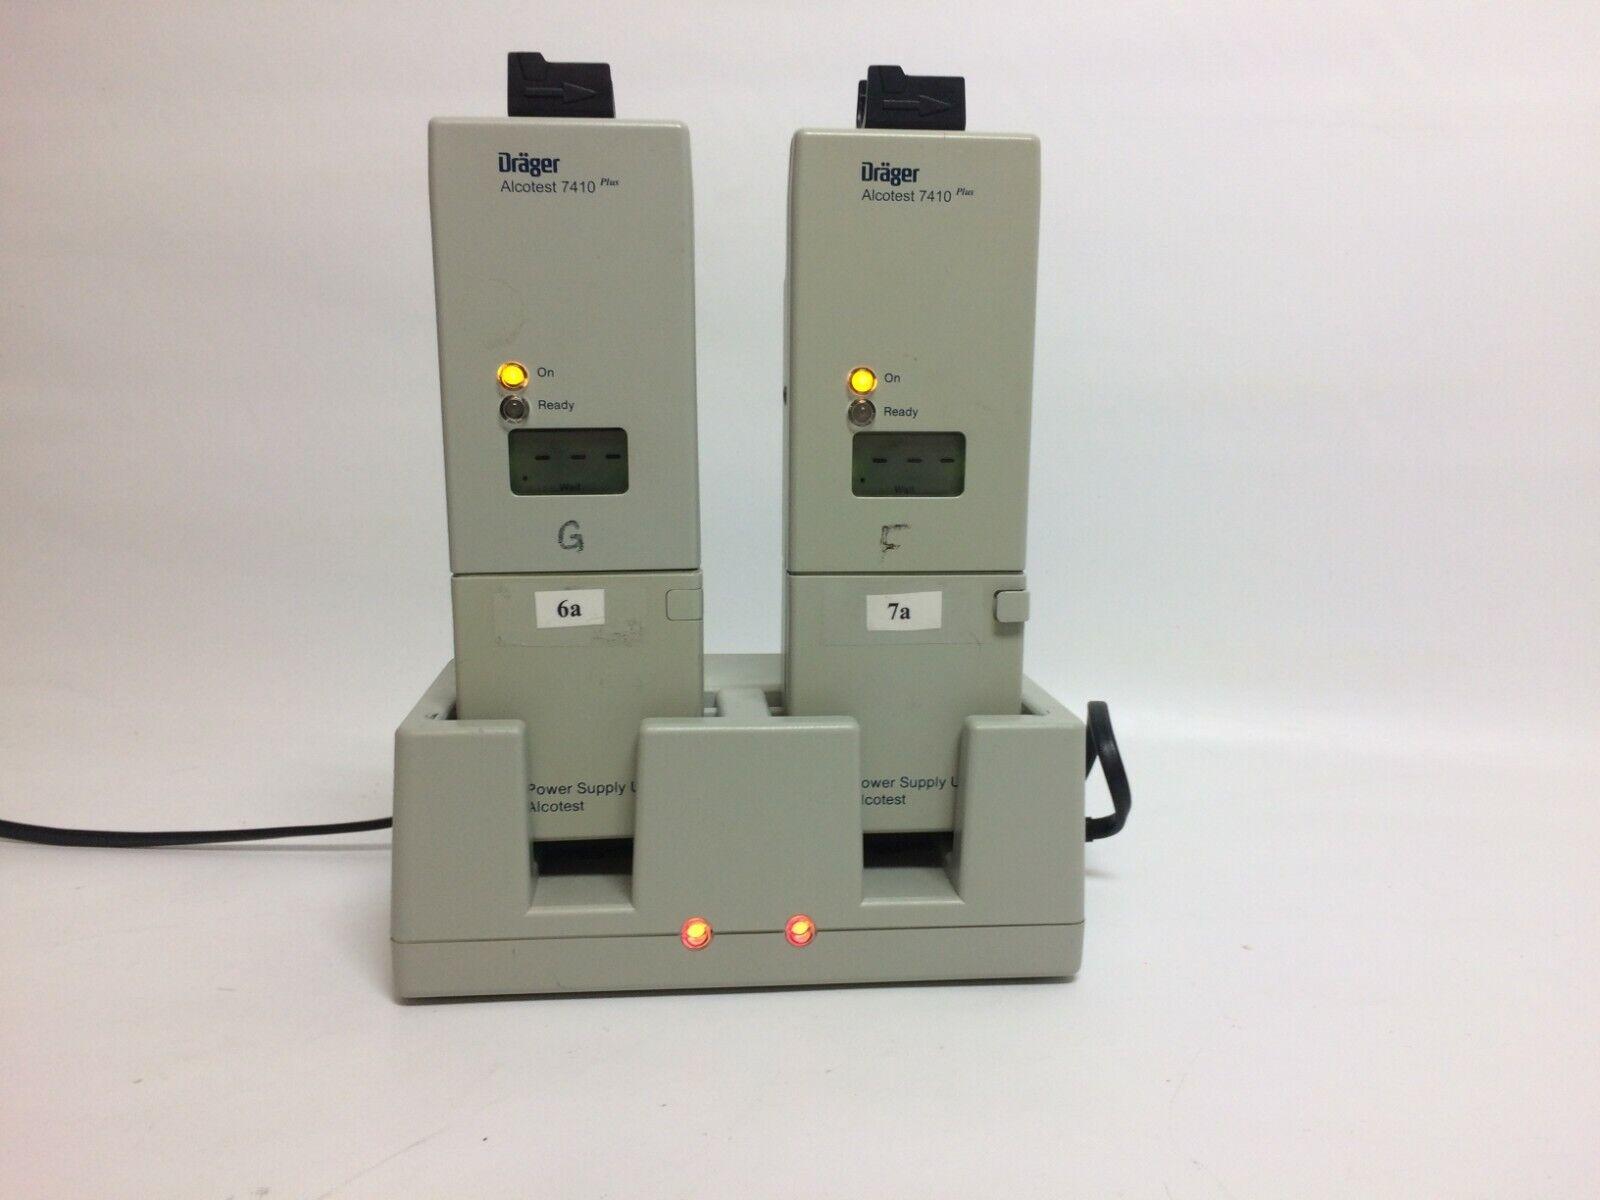 2 DRAGER ALCOTEST 7410 PLUS Breathalyzers W/ Two Batteries & Charging Unit